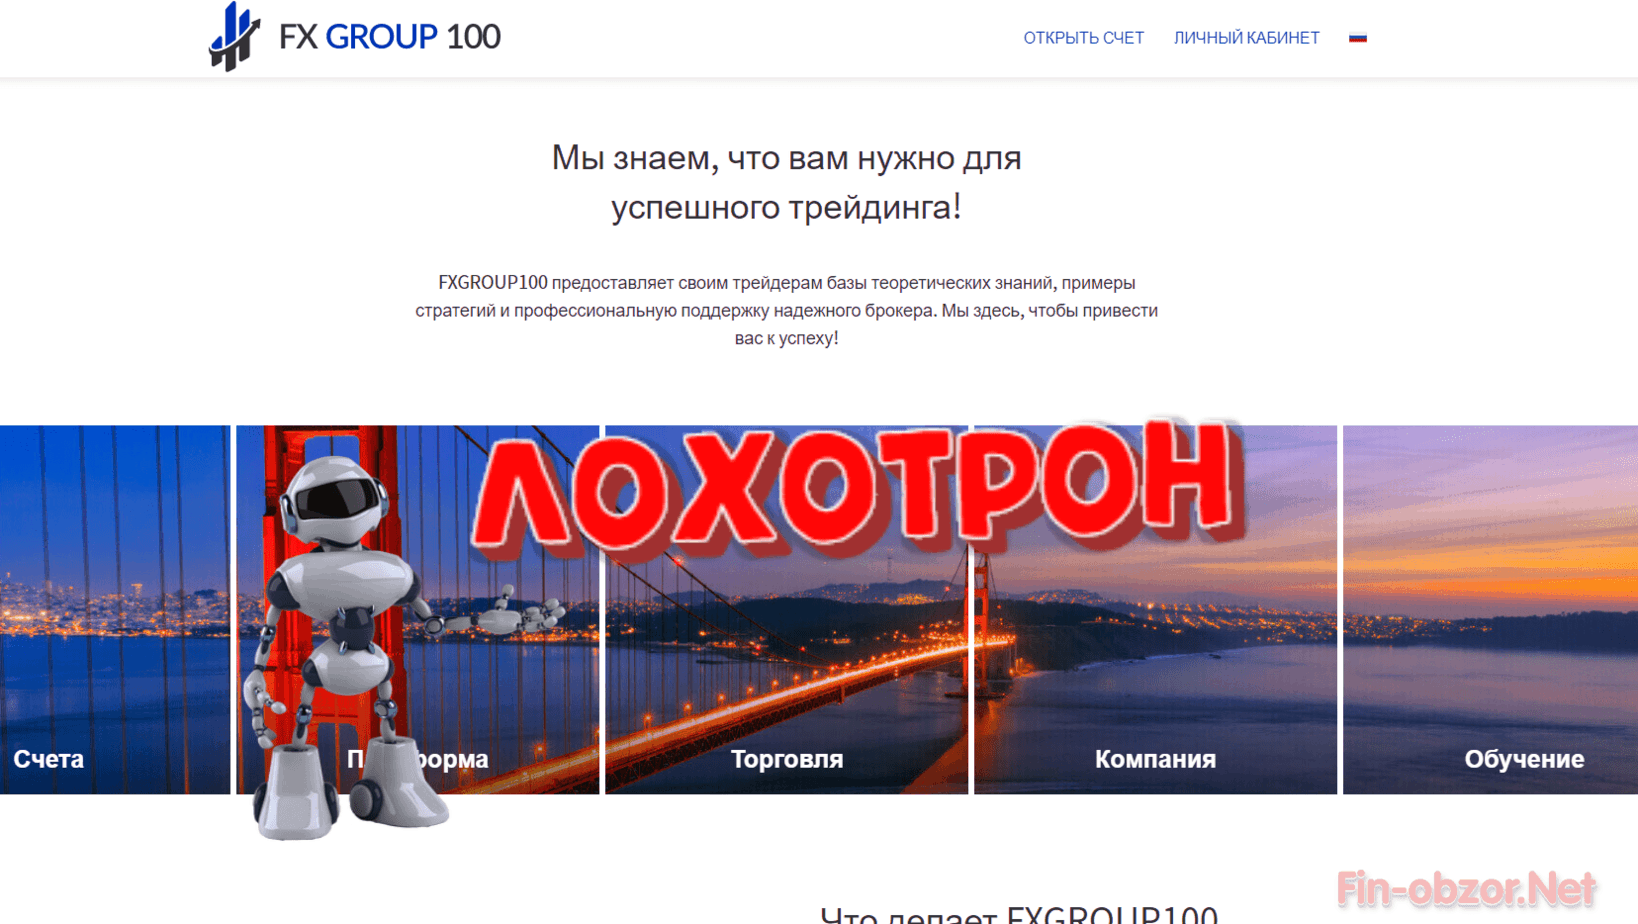 FXGroup100 (fxgroup100.com) - отзывы и проверка брокера